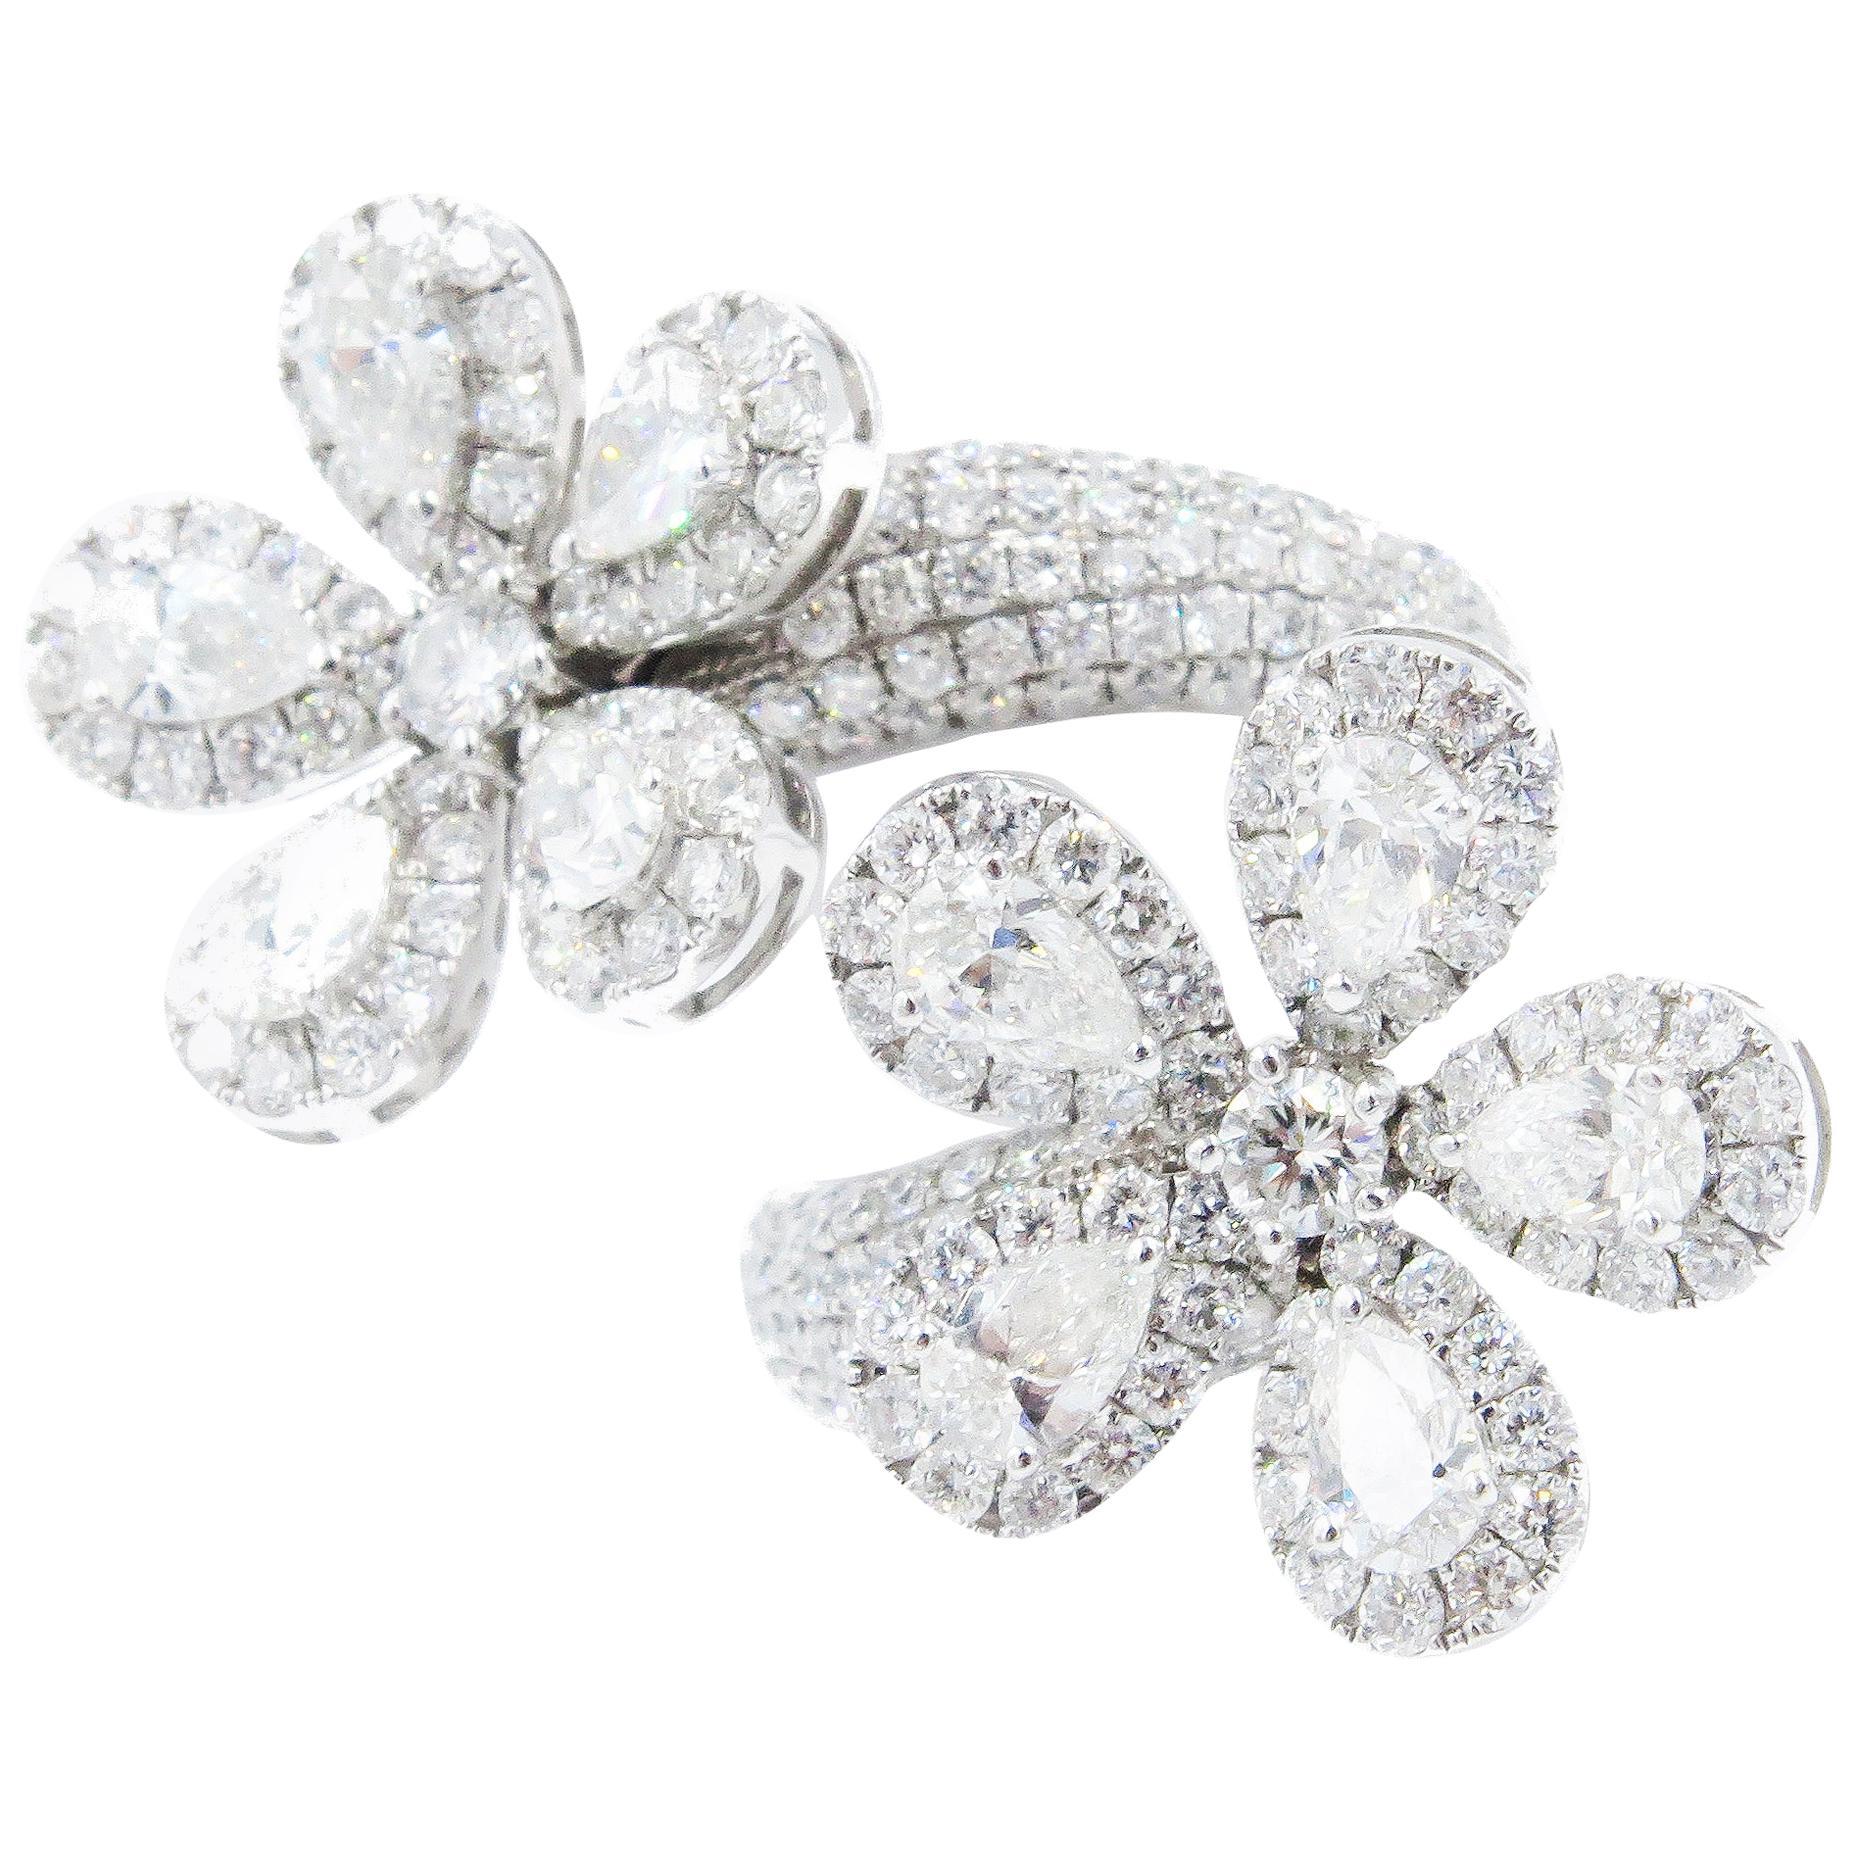 Fancy Double Flower Spiral Ring